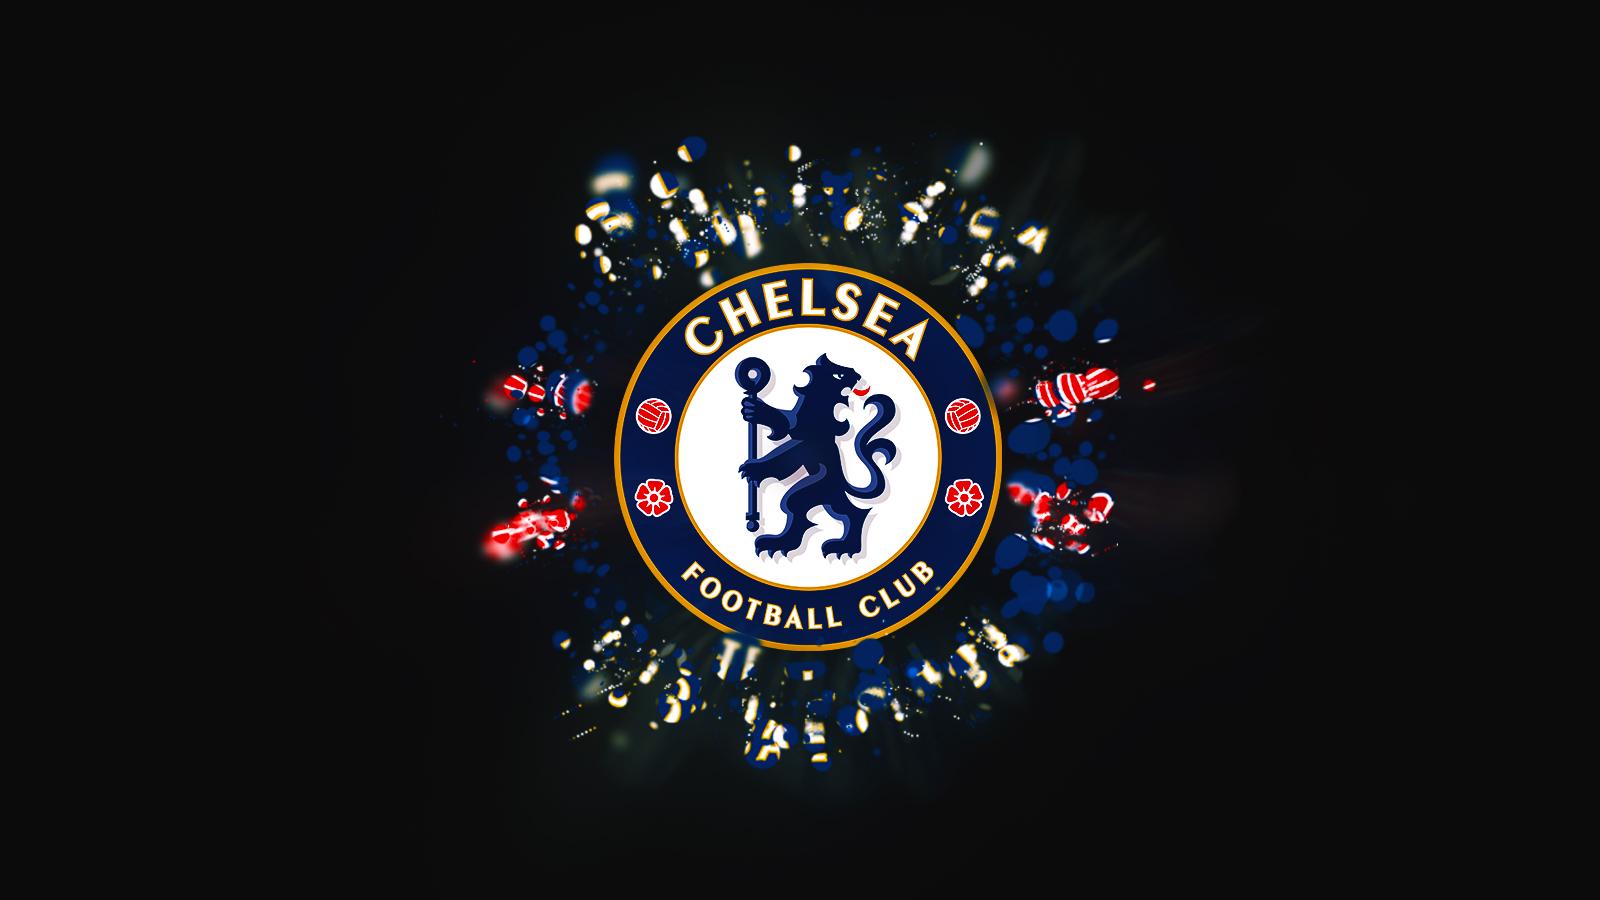 Gallery In Dark Background Chelsea FC Golden Blue Wallpaper HD 1600x900